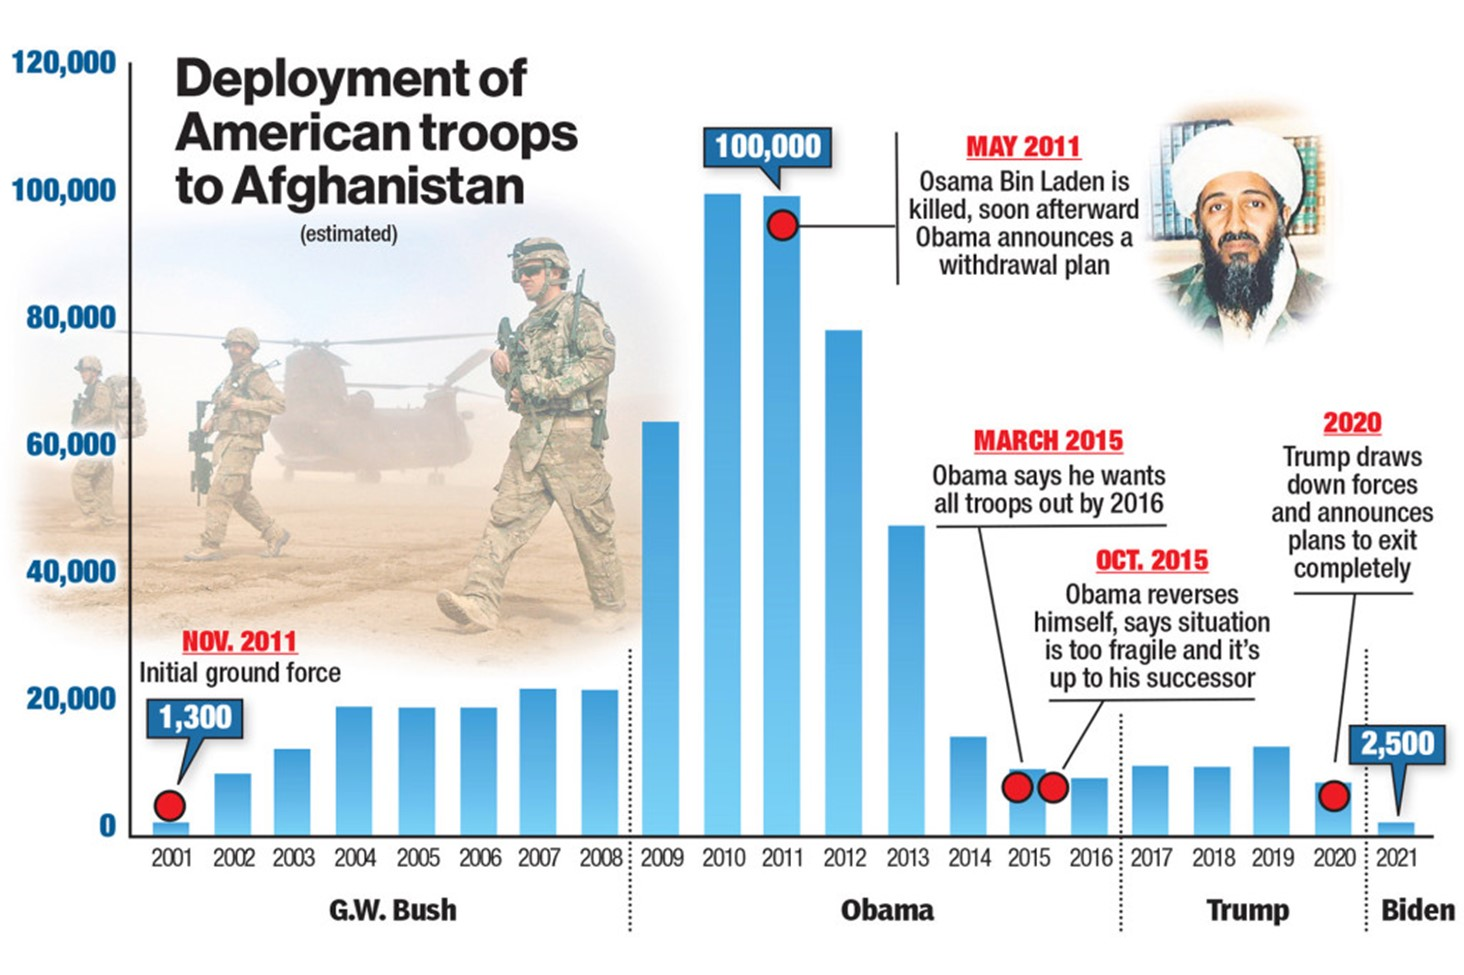 timeline-of-us-troops-deployed-to-afghan